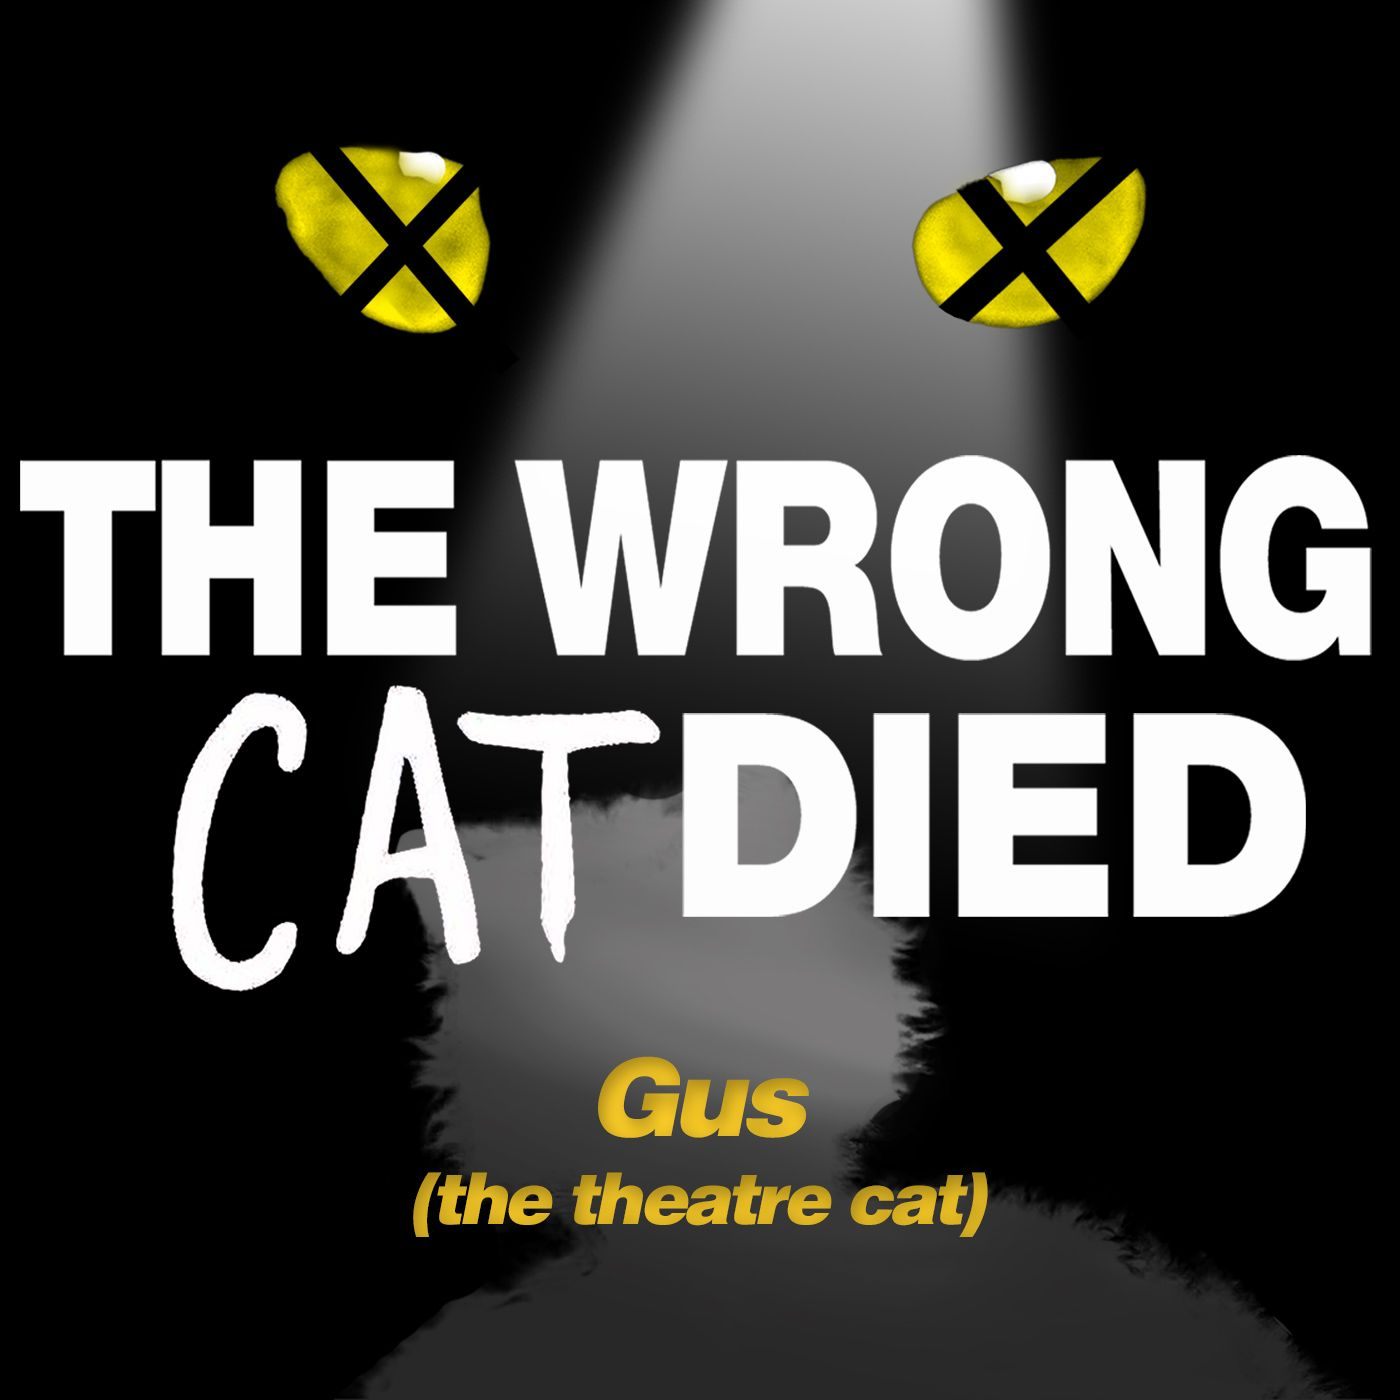 Ep7 - Gus, the theatre cat